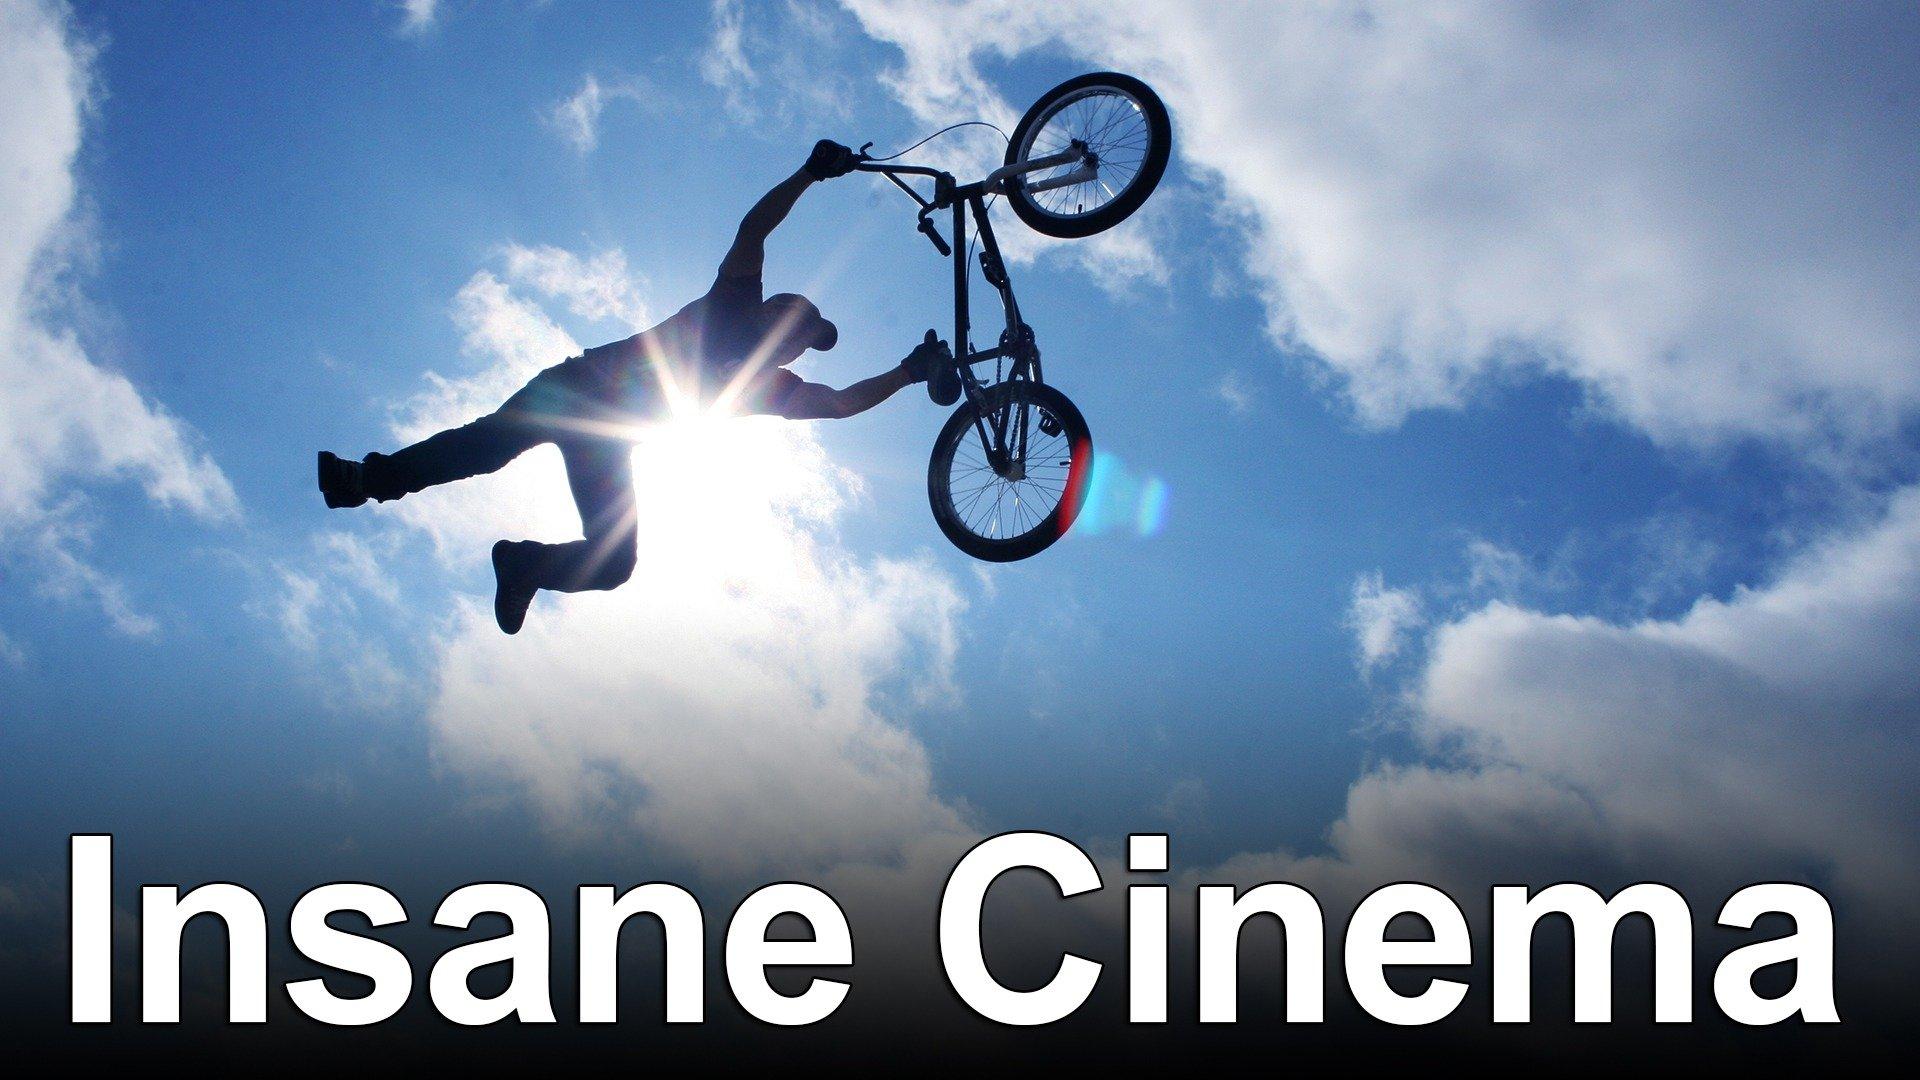 Insane Cinema